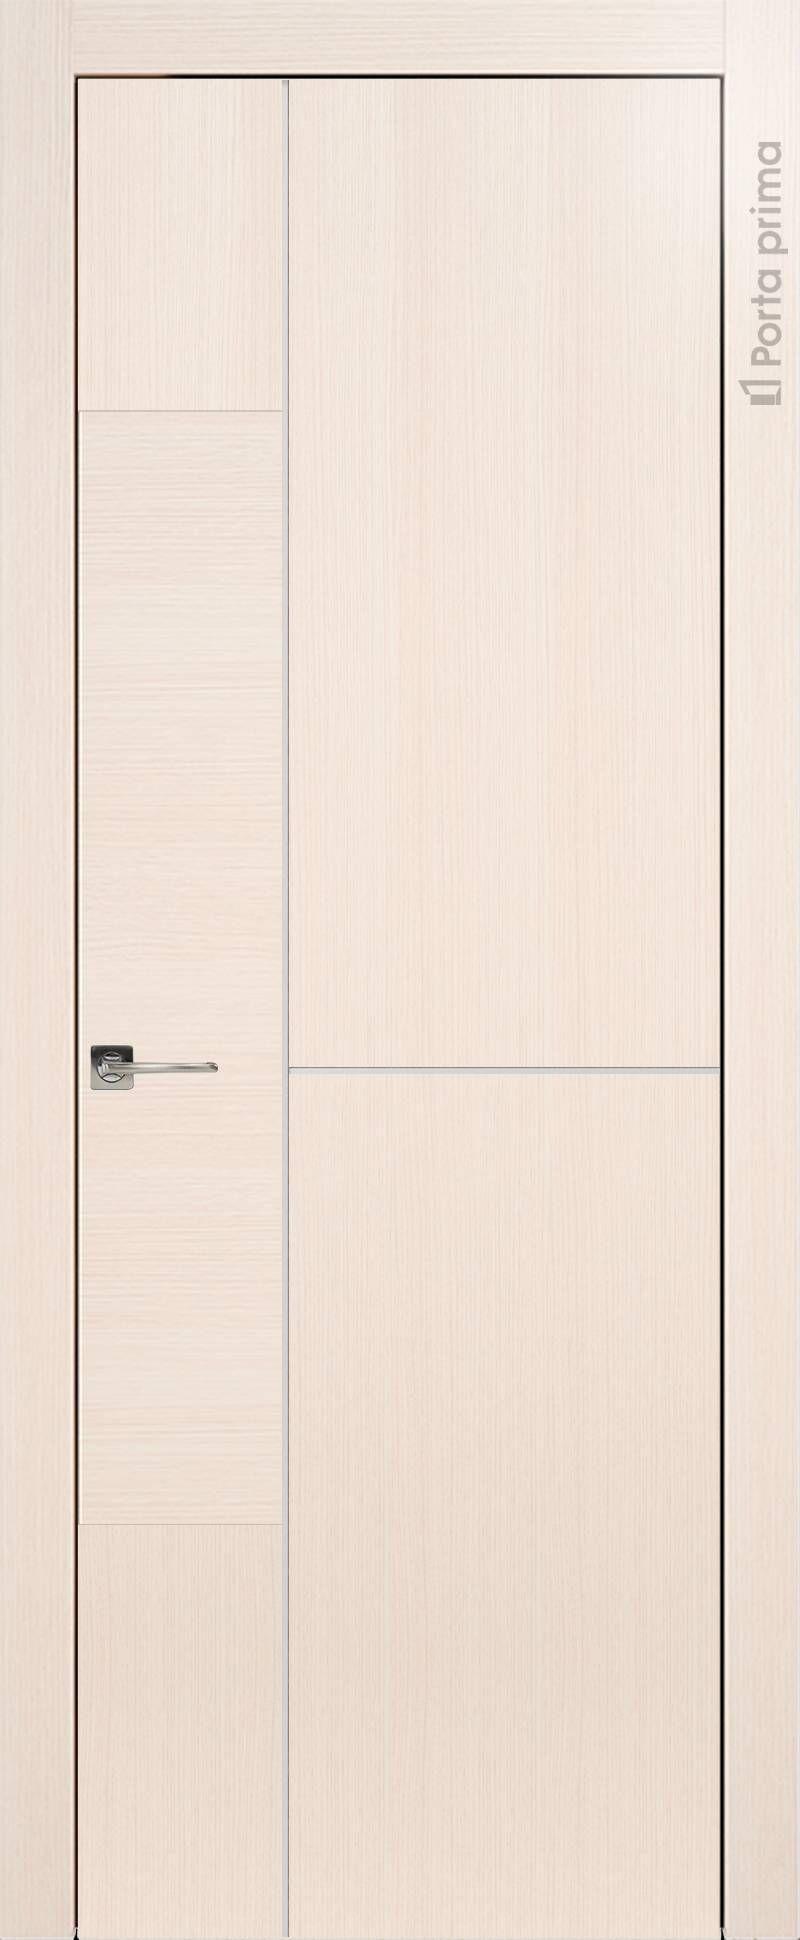 Tivoli Г-1 цвет - Беленый дуб Без стекла (ДГ)